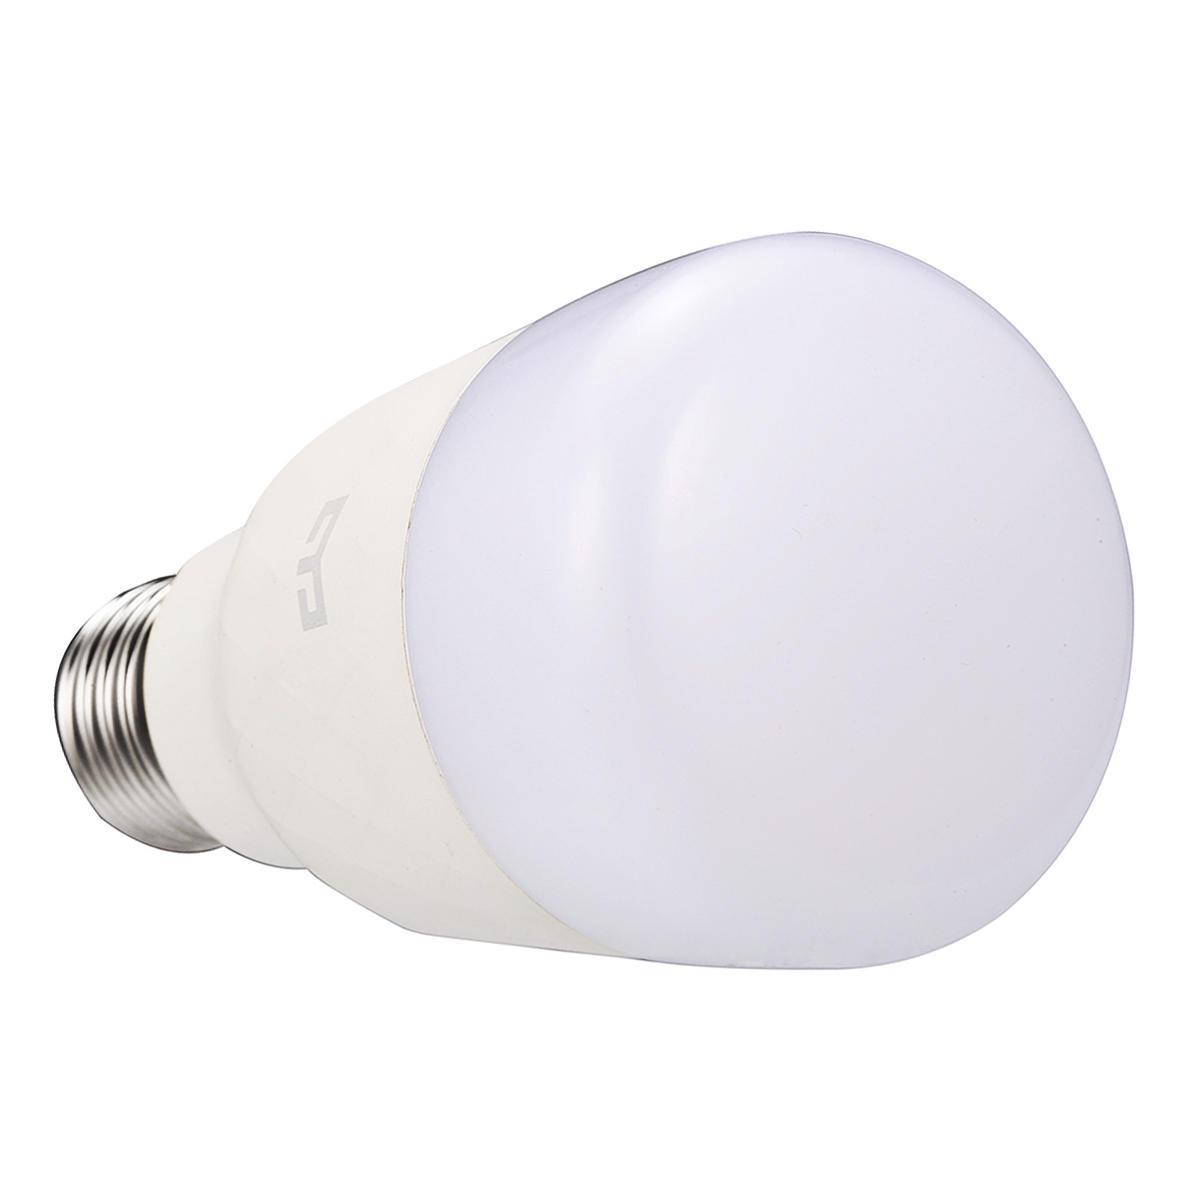 Yeelight YLDP06YL E26 E27 10W RGBW Smart LED Bulb Work With Amazon Alexa AC100-240V (Xiaomi Ecosystem Product) - 4